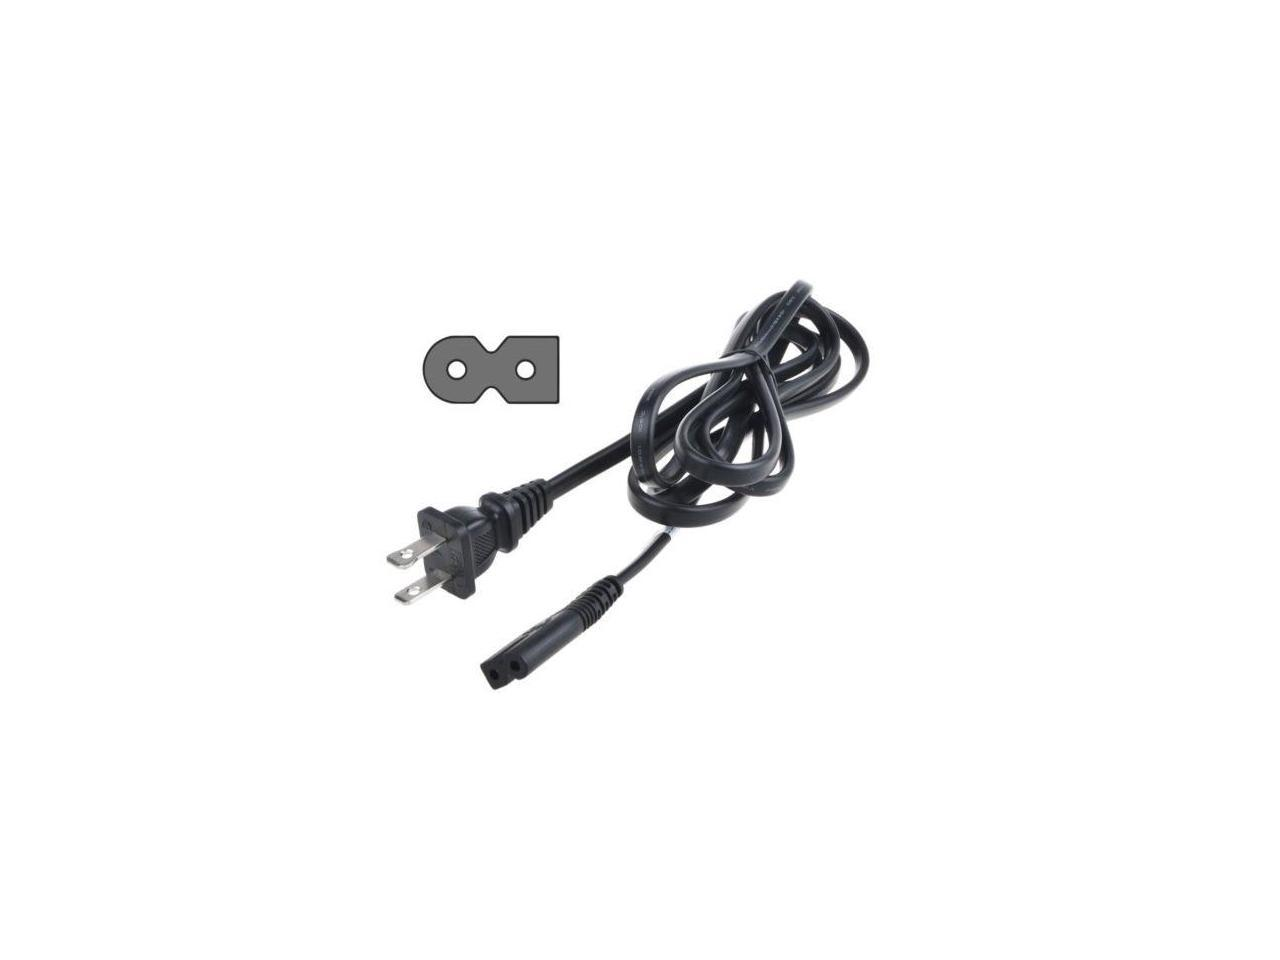 Globalsaving Polarized Ac Power Cord For Vizio E Series M